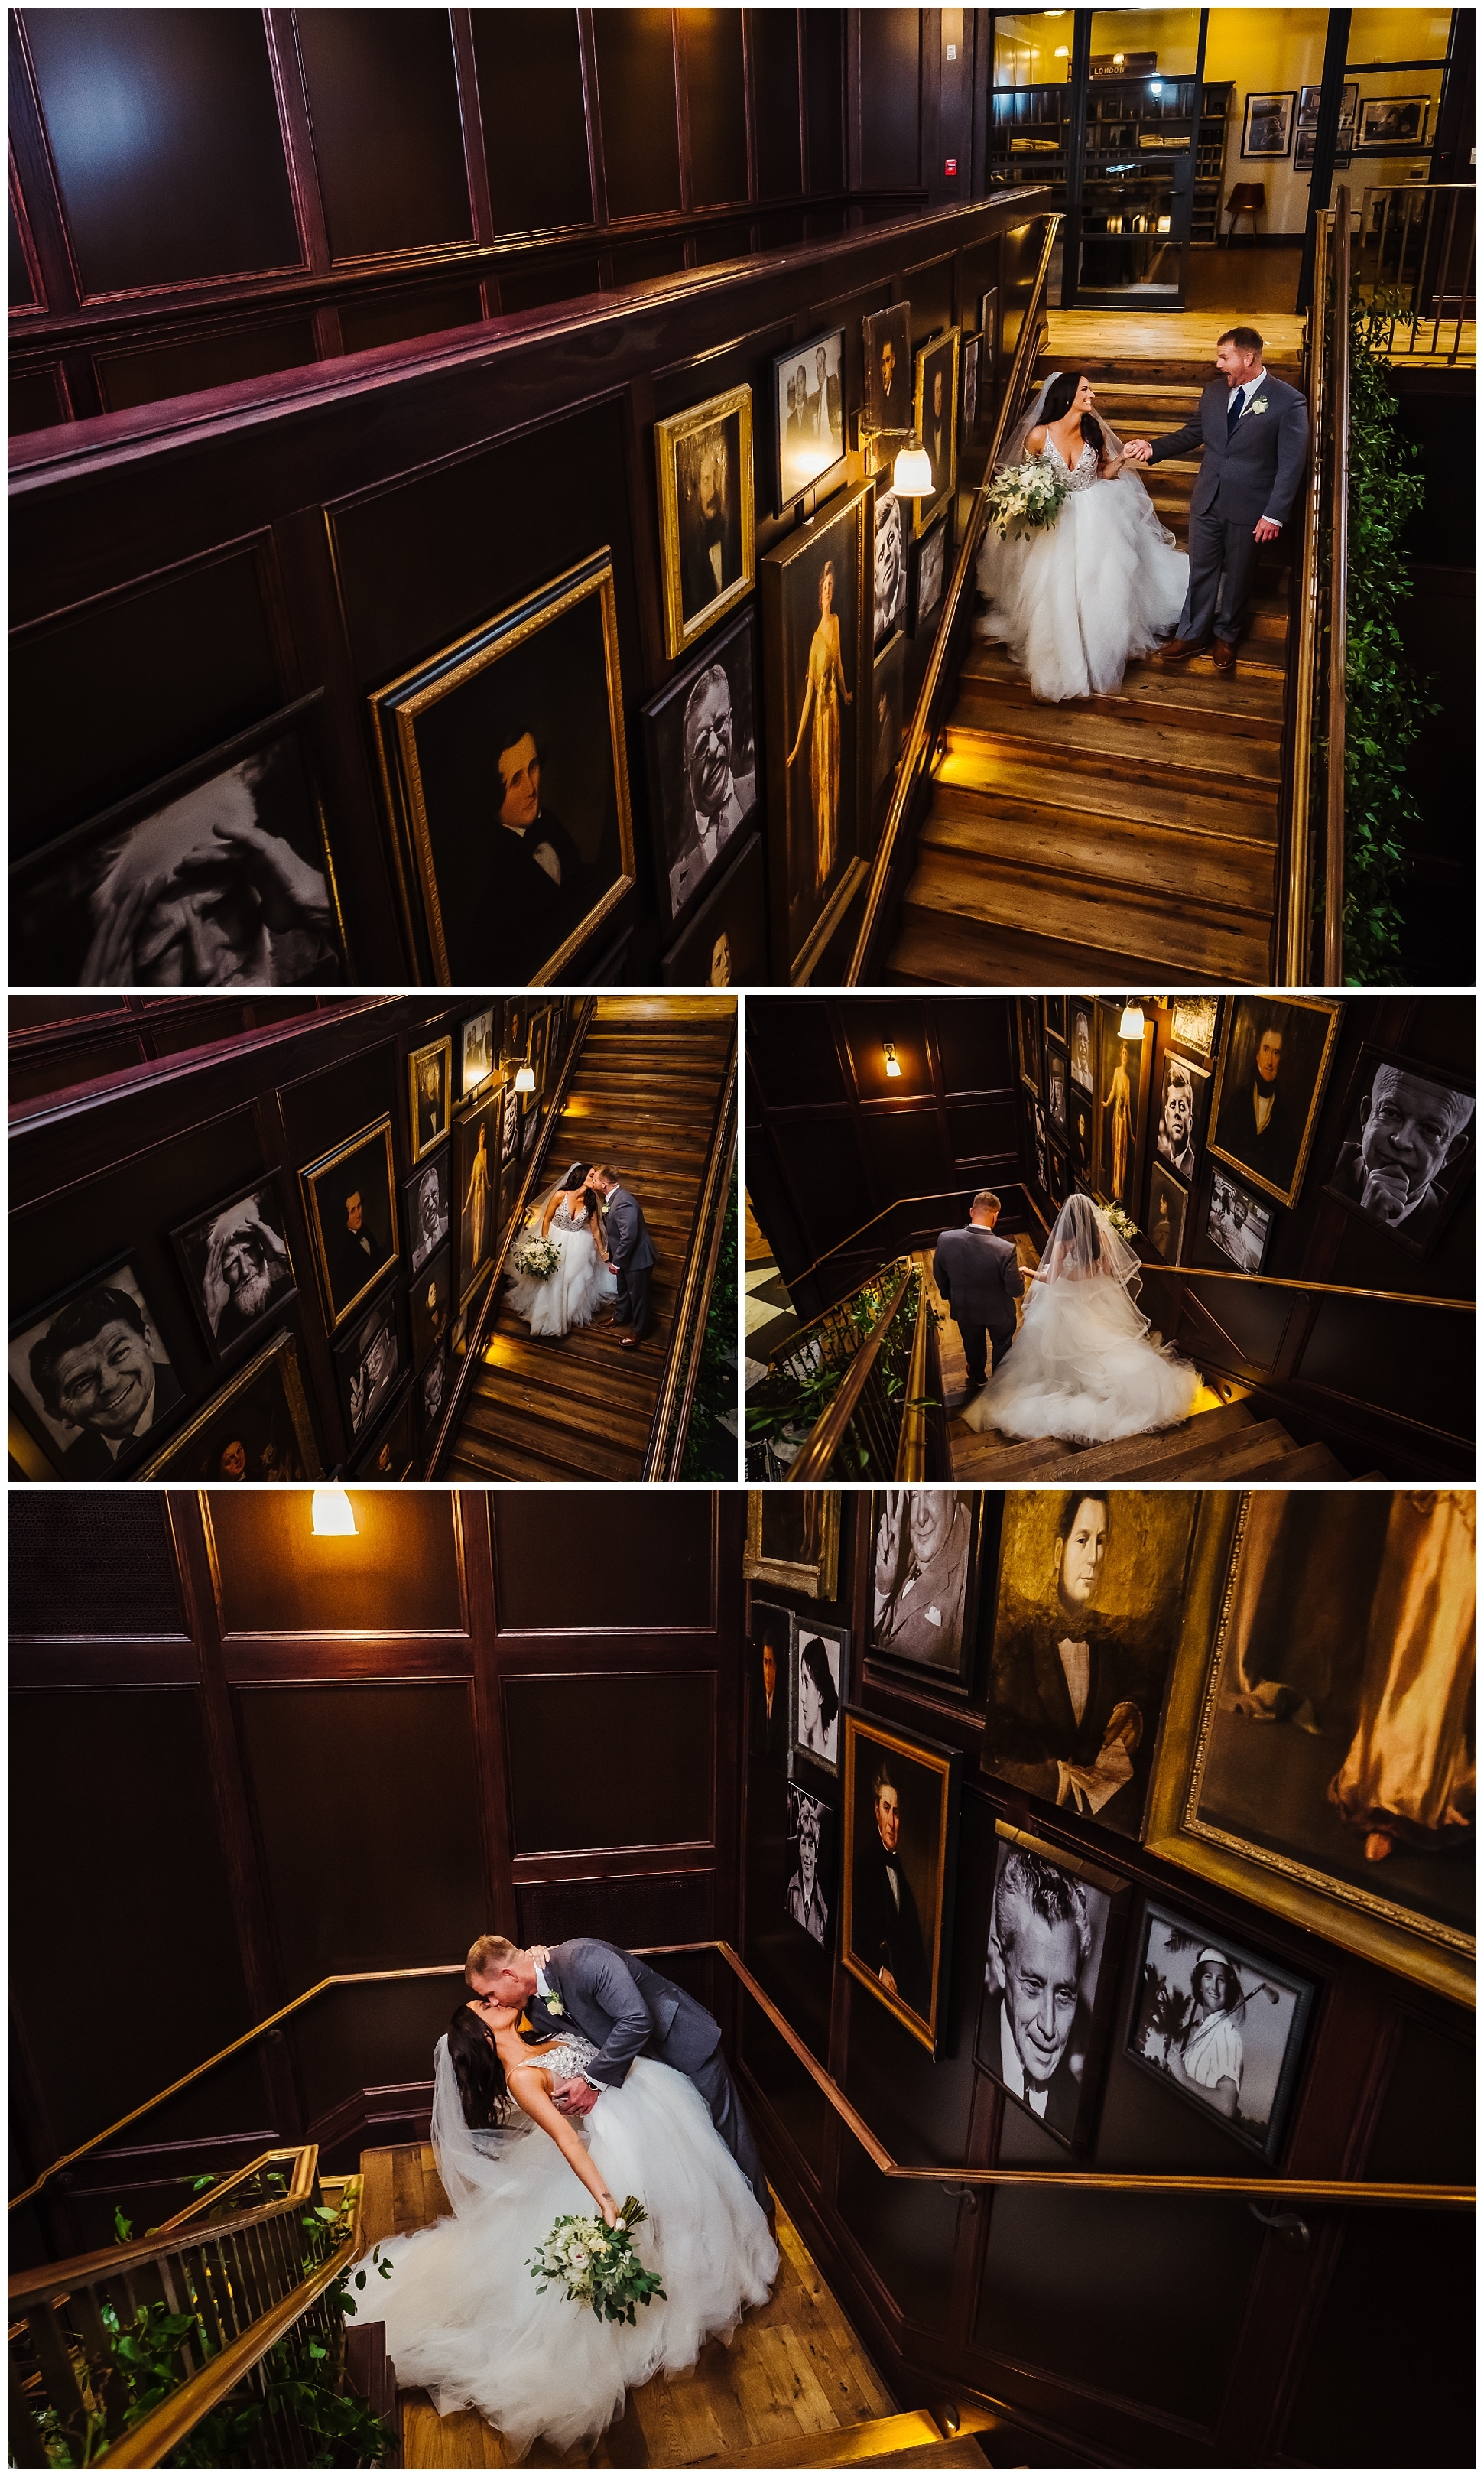 tampa-wedding-photographer-oxford-exchange-garland-candlelight-gold-hayley-paige_0039.jpg